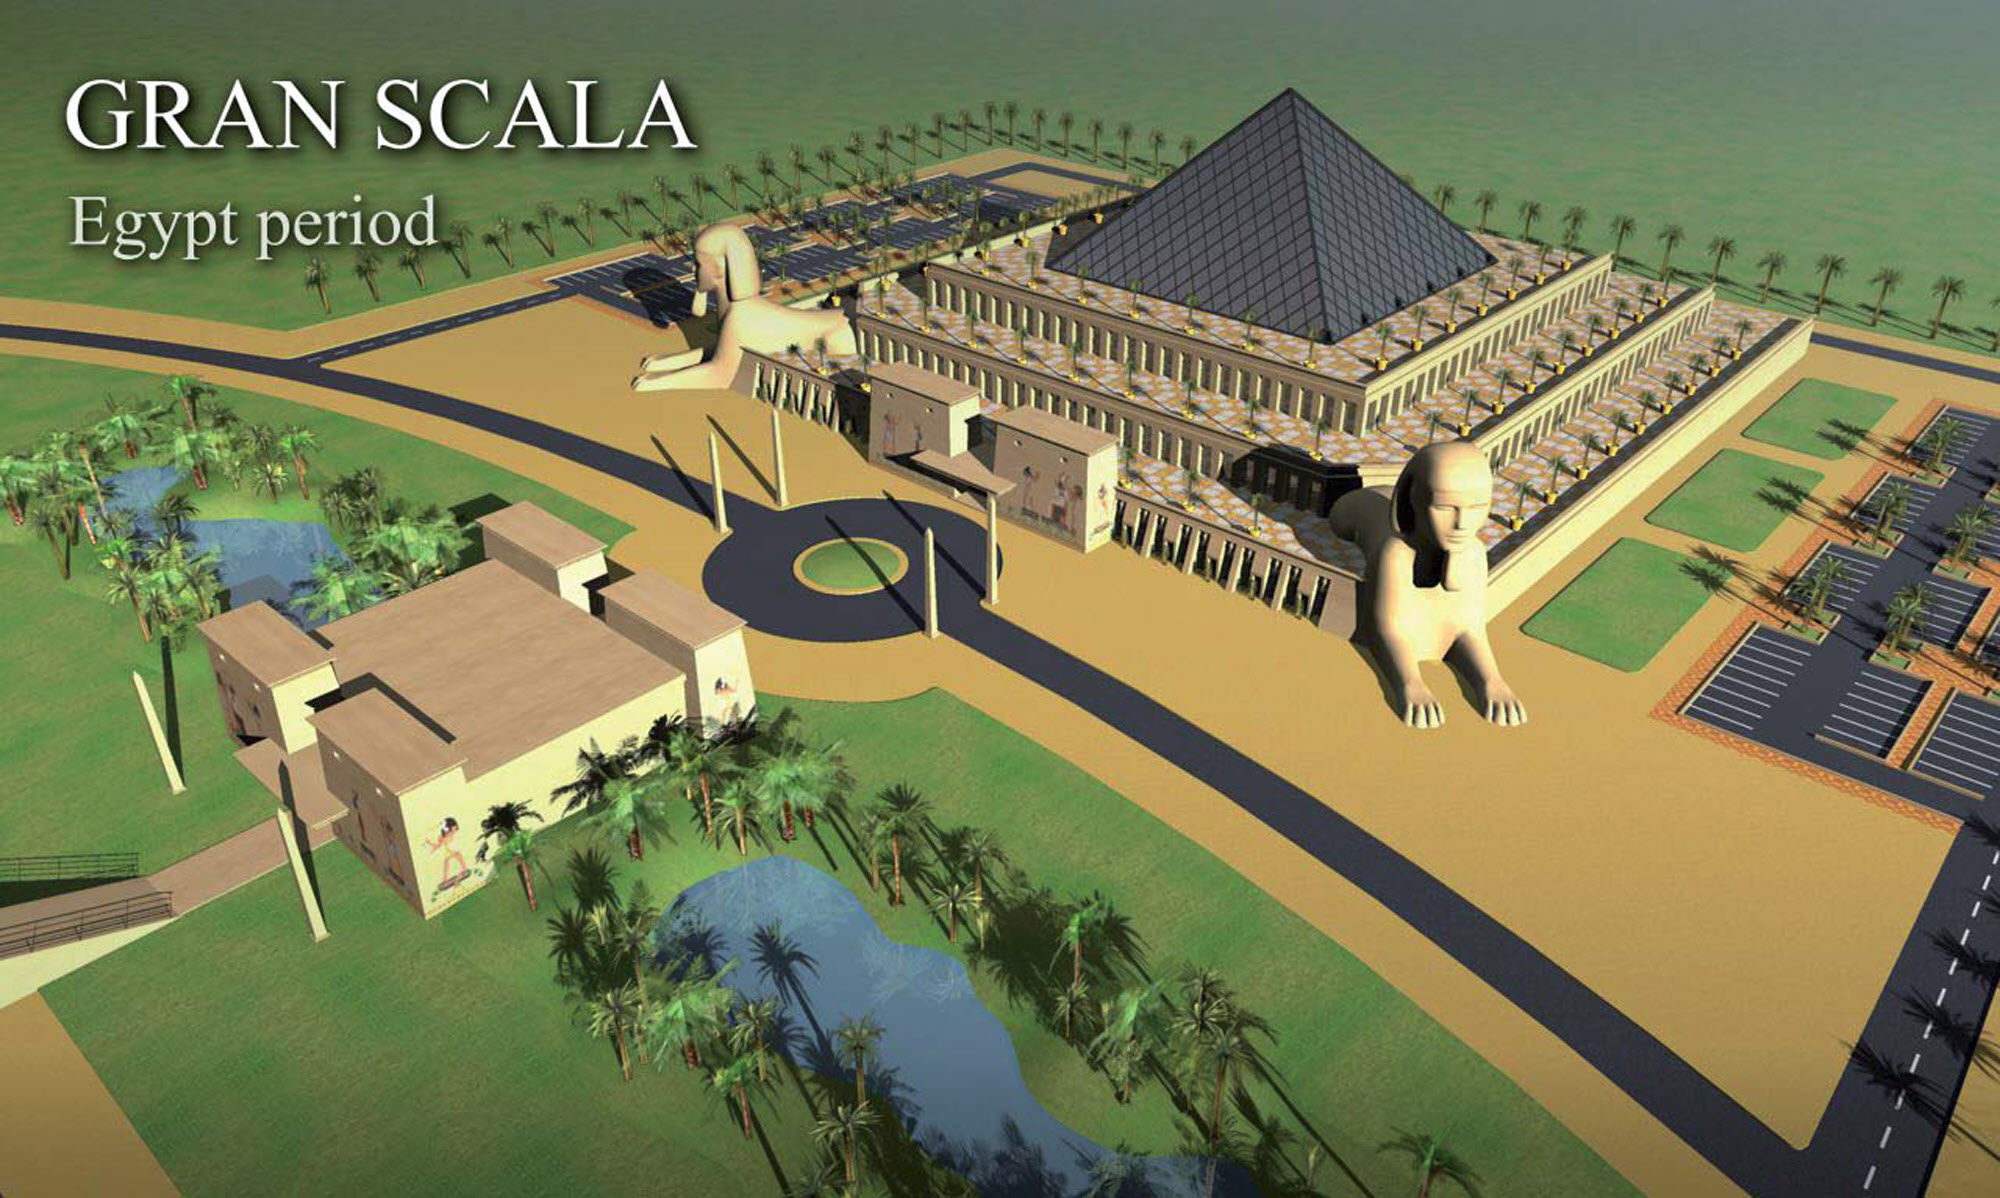 SPAIN-CONSTRUCTION-CASINO